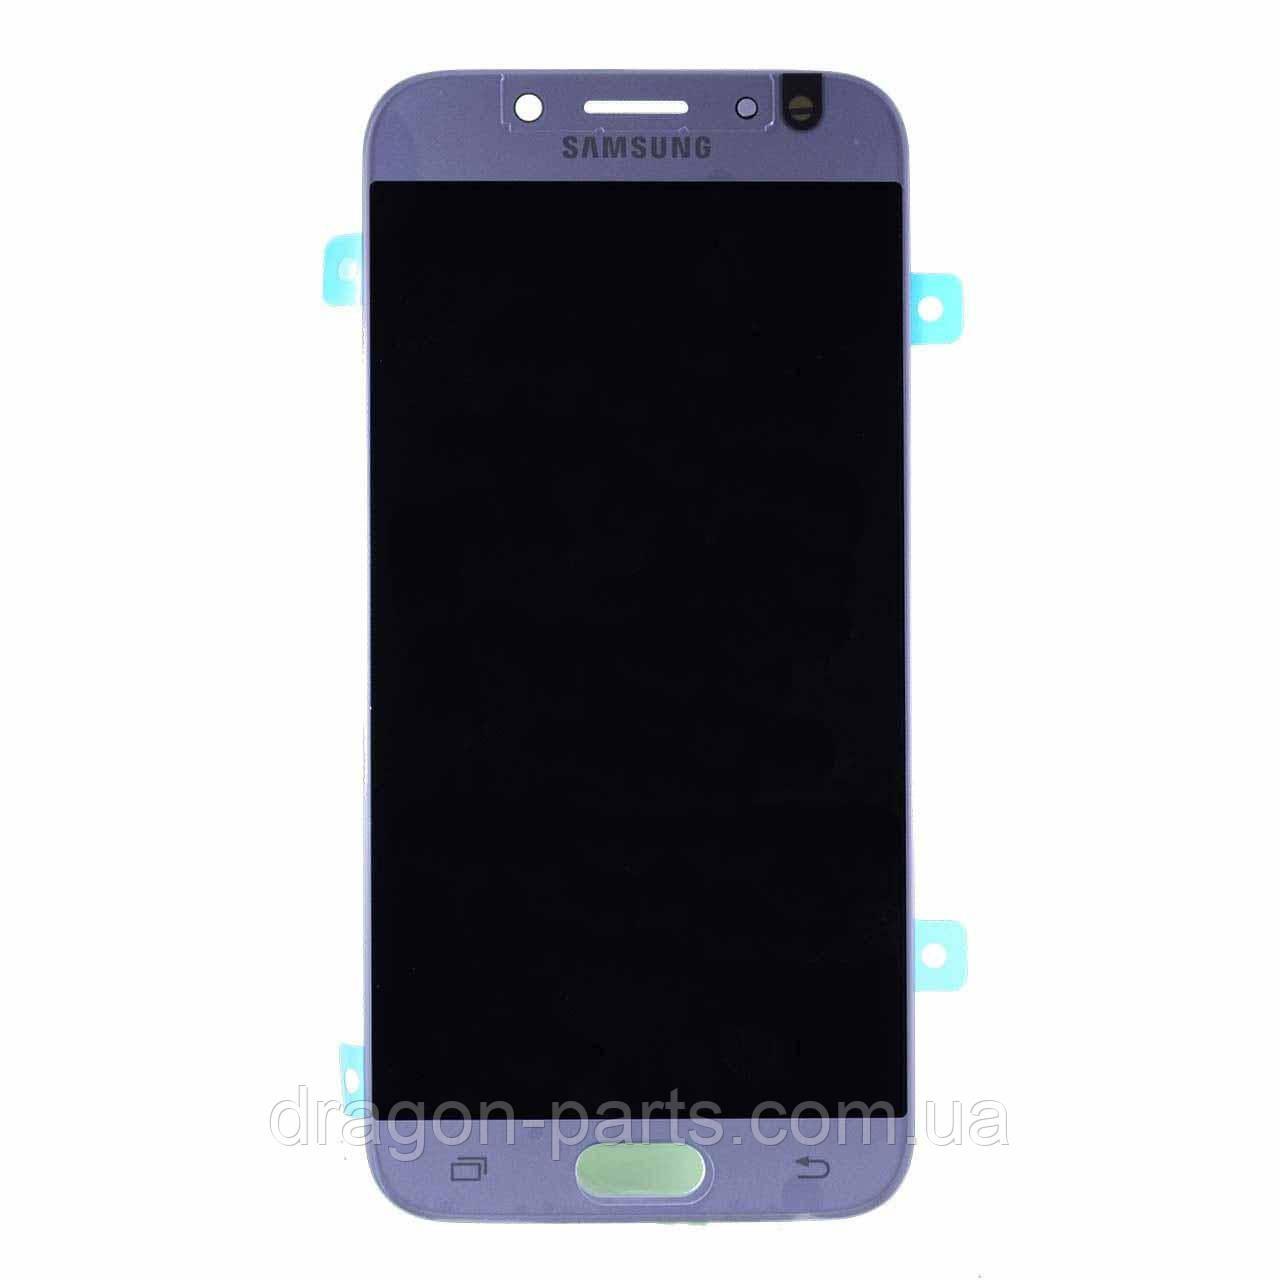 Дисплей Samsung J530 Galaxy J5 2017 с сенсором Серебряный Silver оригинал , GH97-20738B